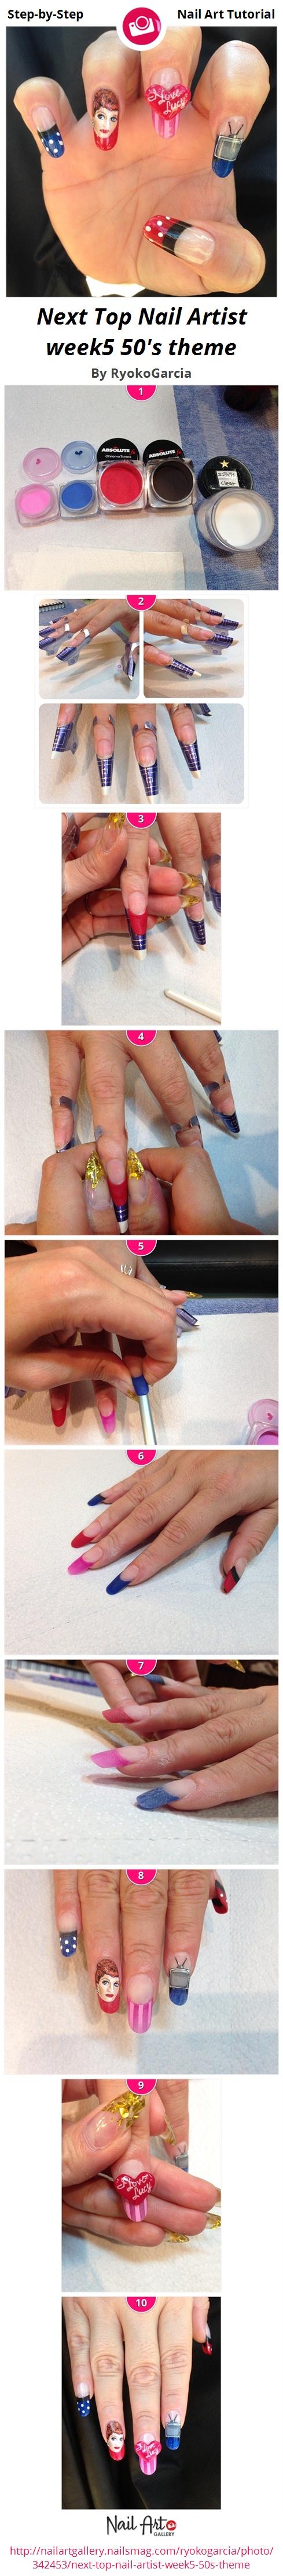 Next Top Nail Artist week8 Femme Fatale by RyokoGarcia - Nail Art ...